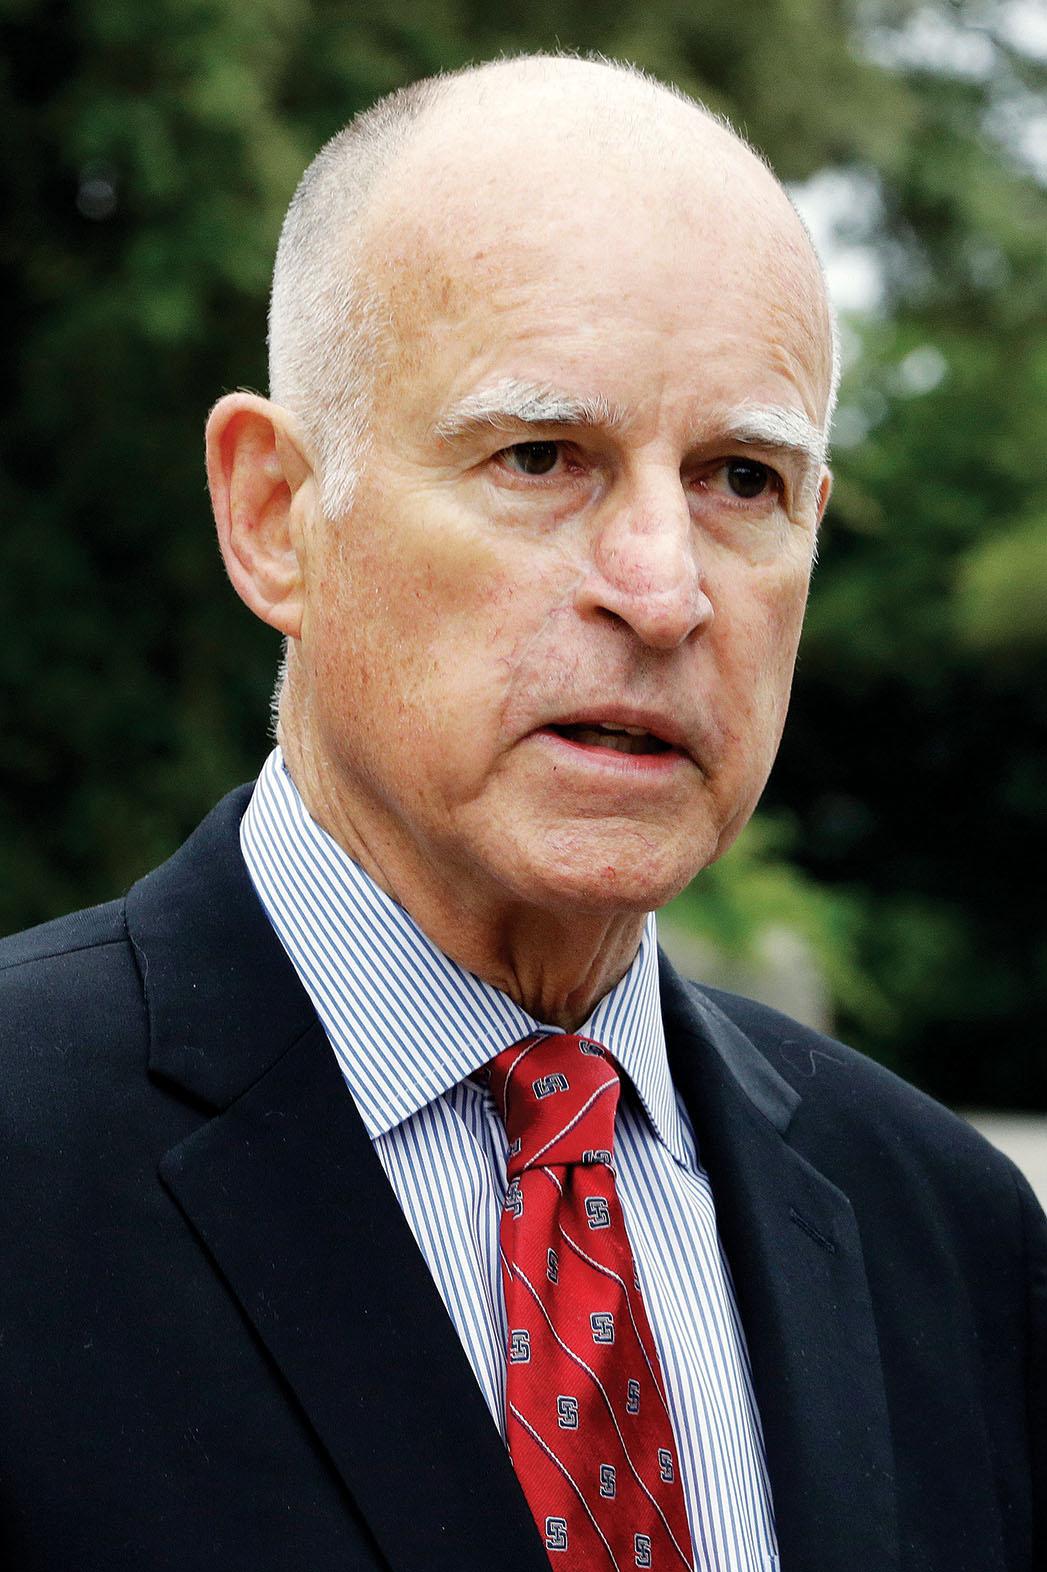 Gov. Jerry Brown Headshot - P 2014